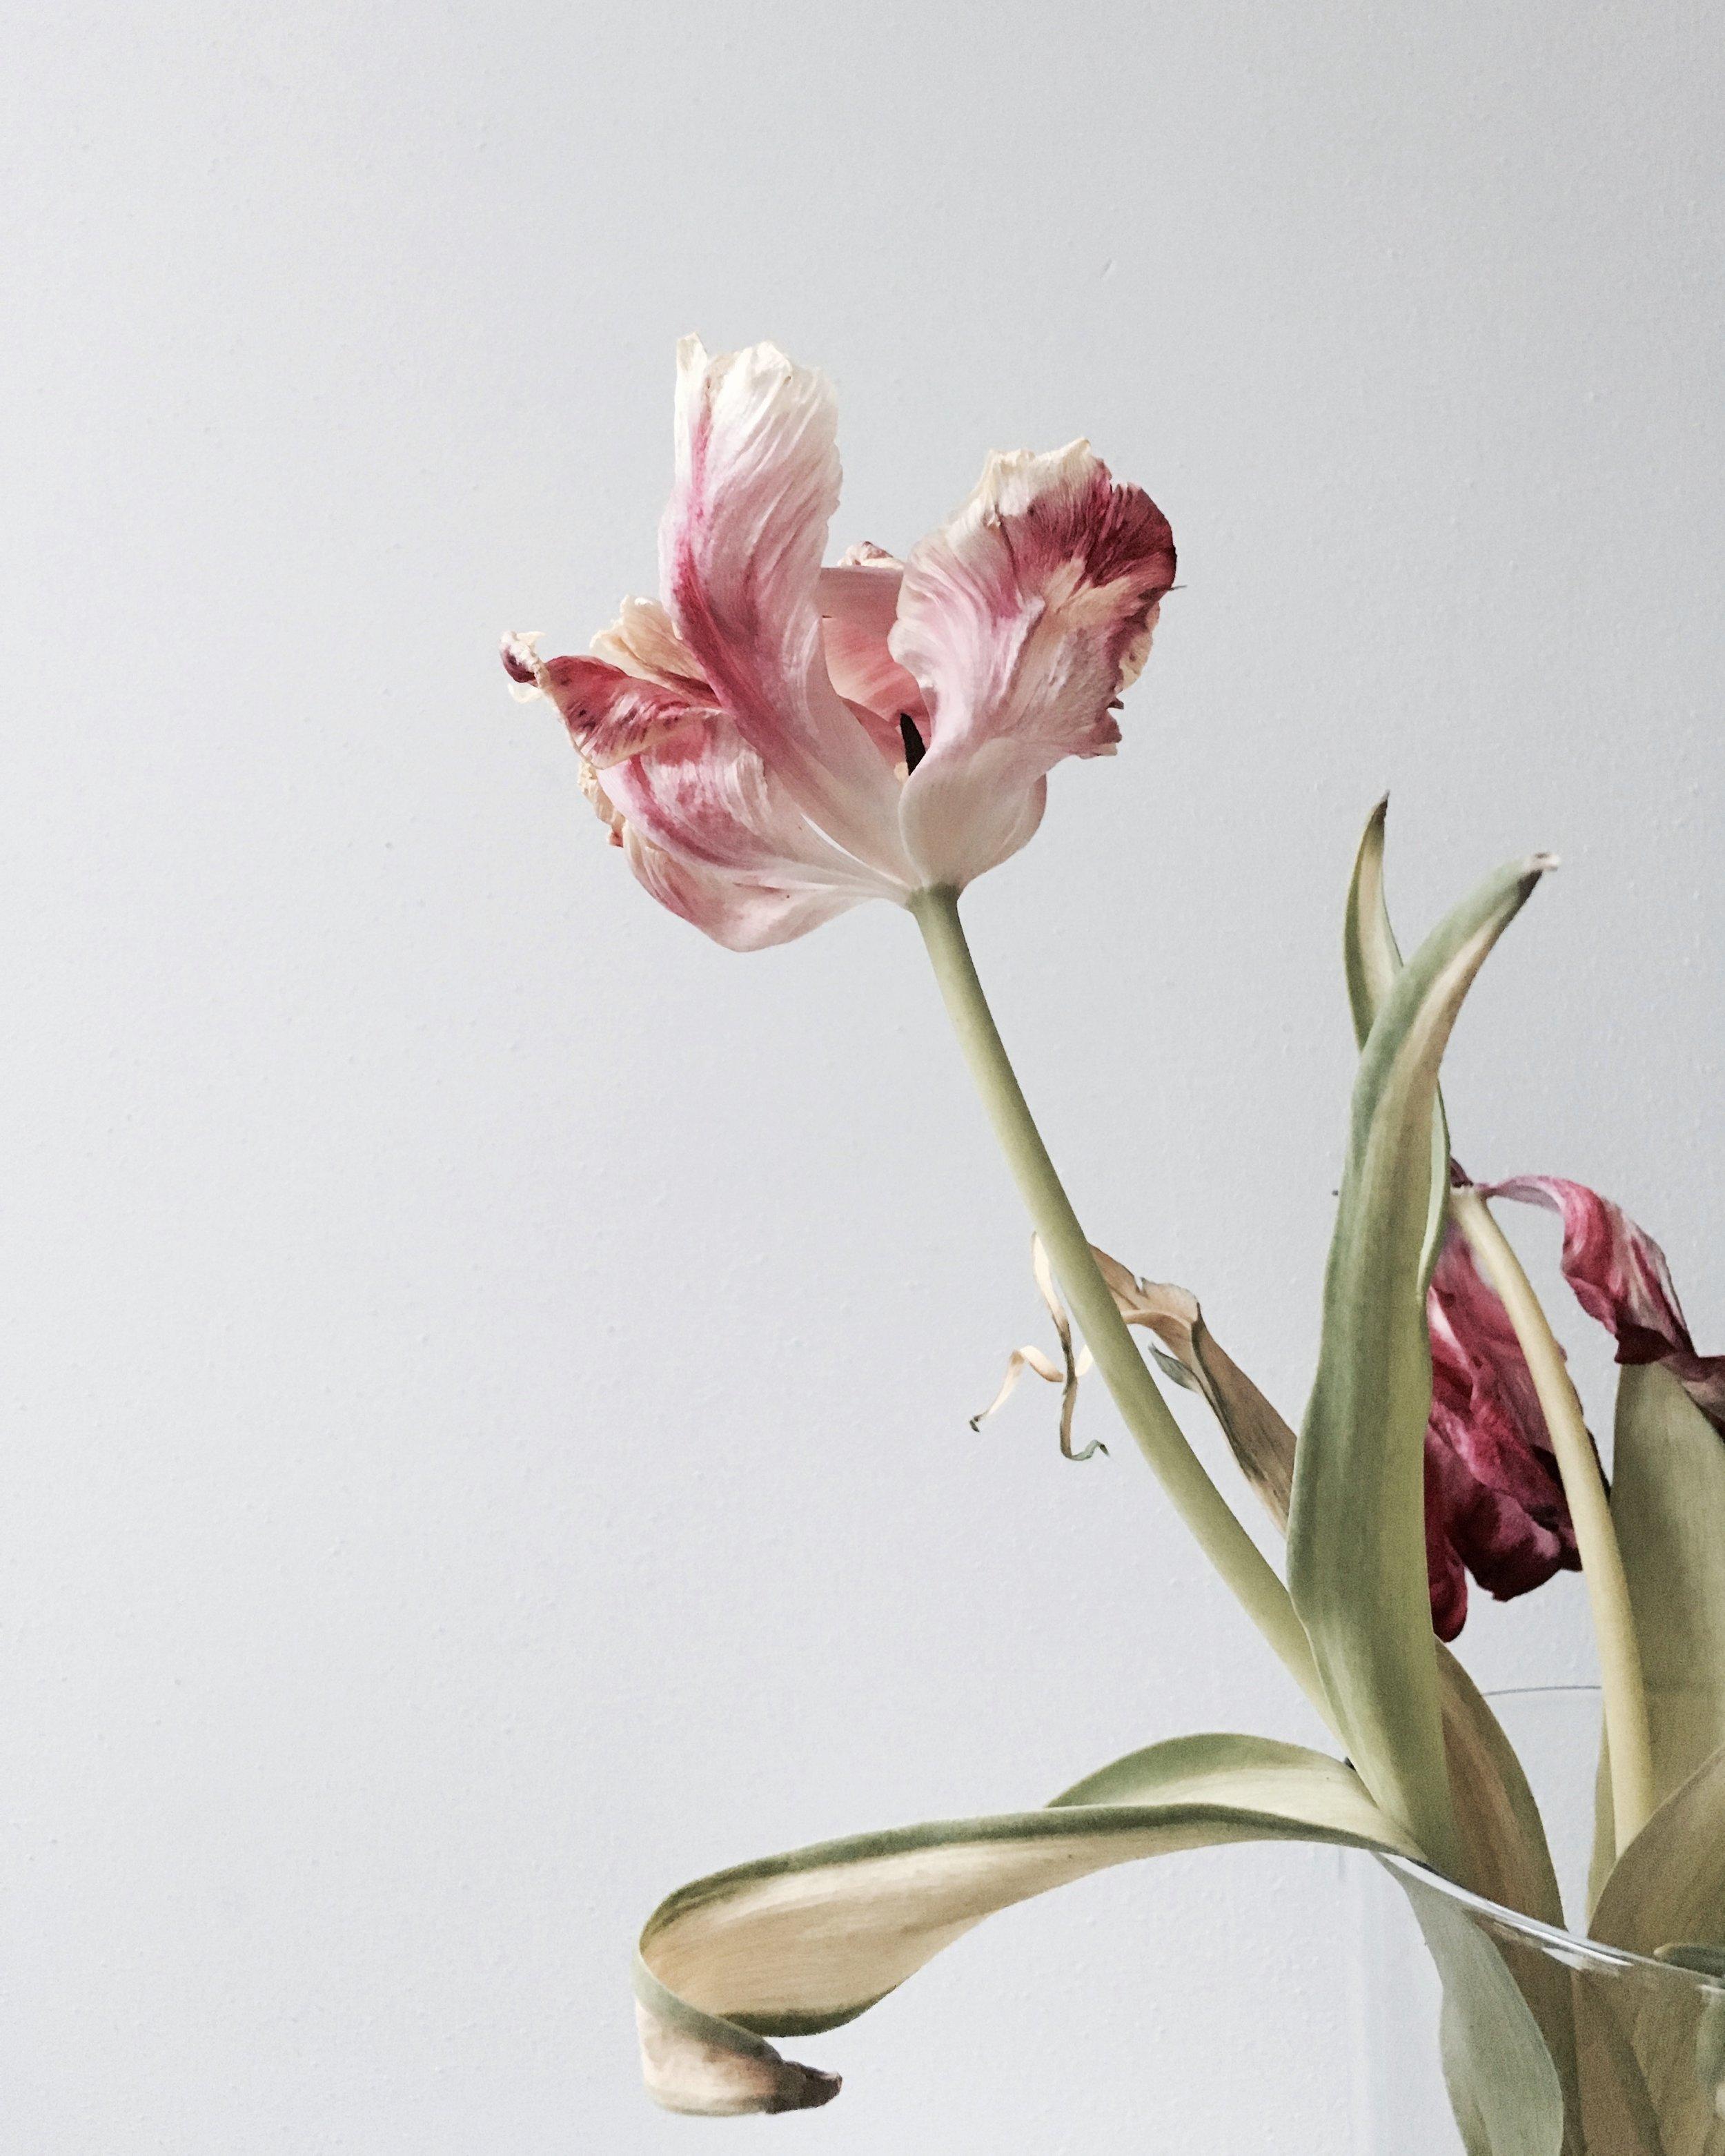 tulip 2.JPG